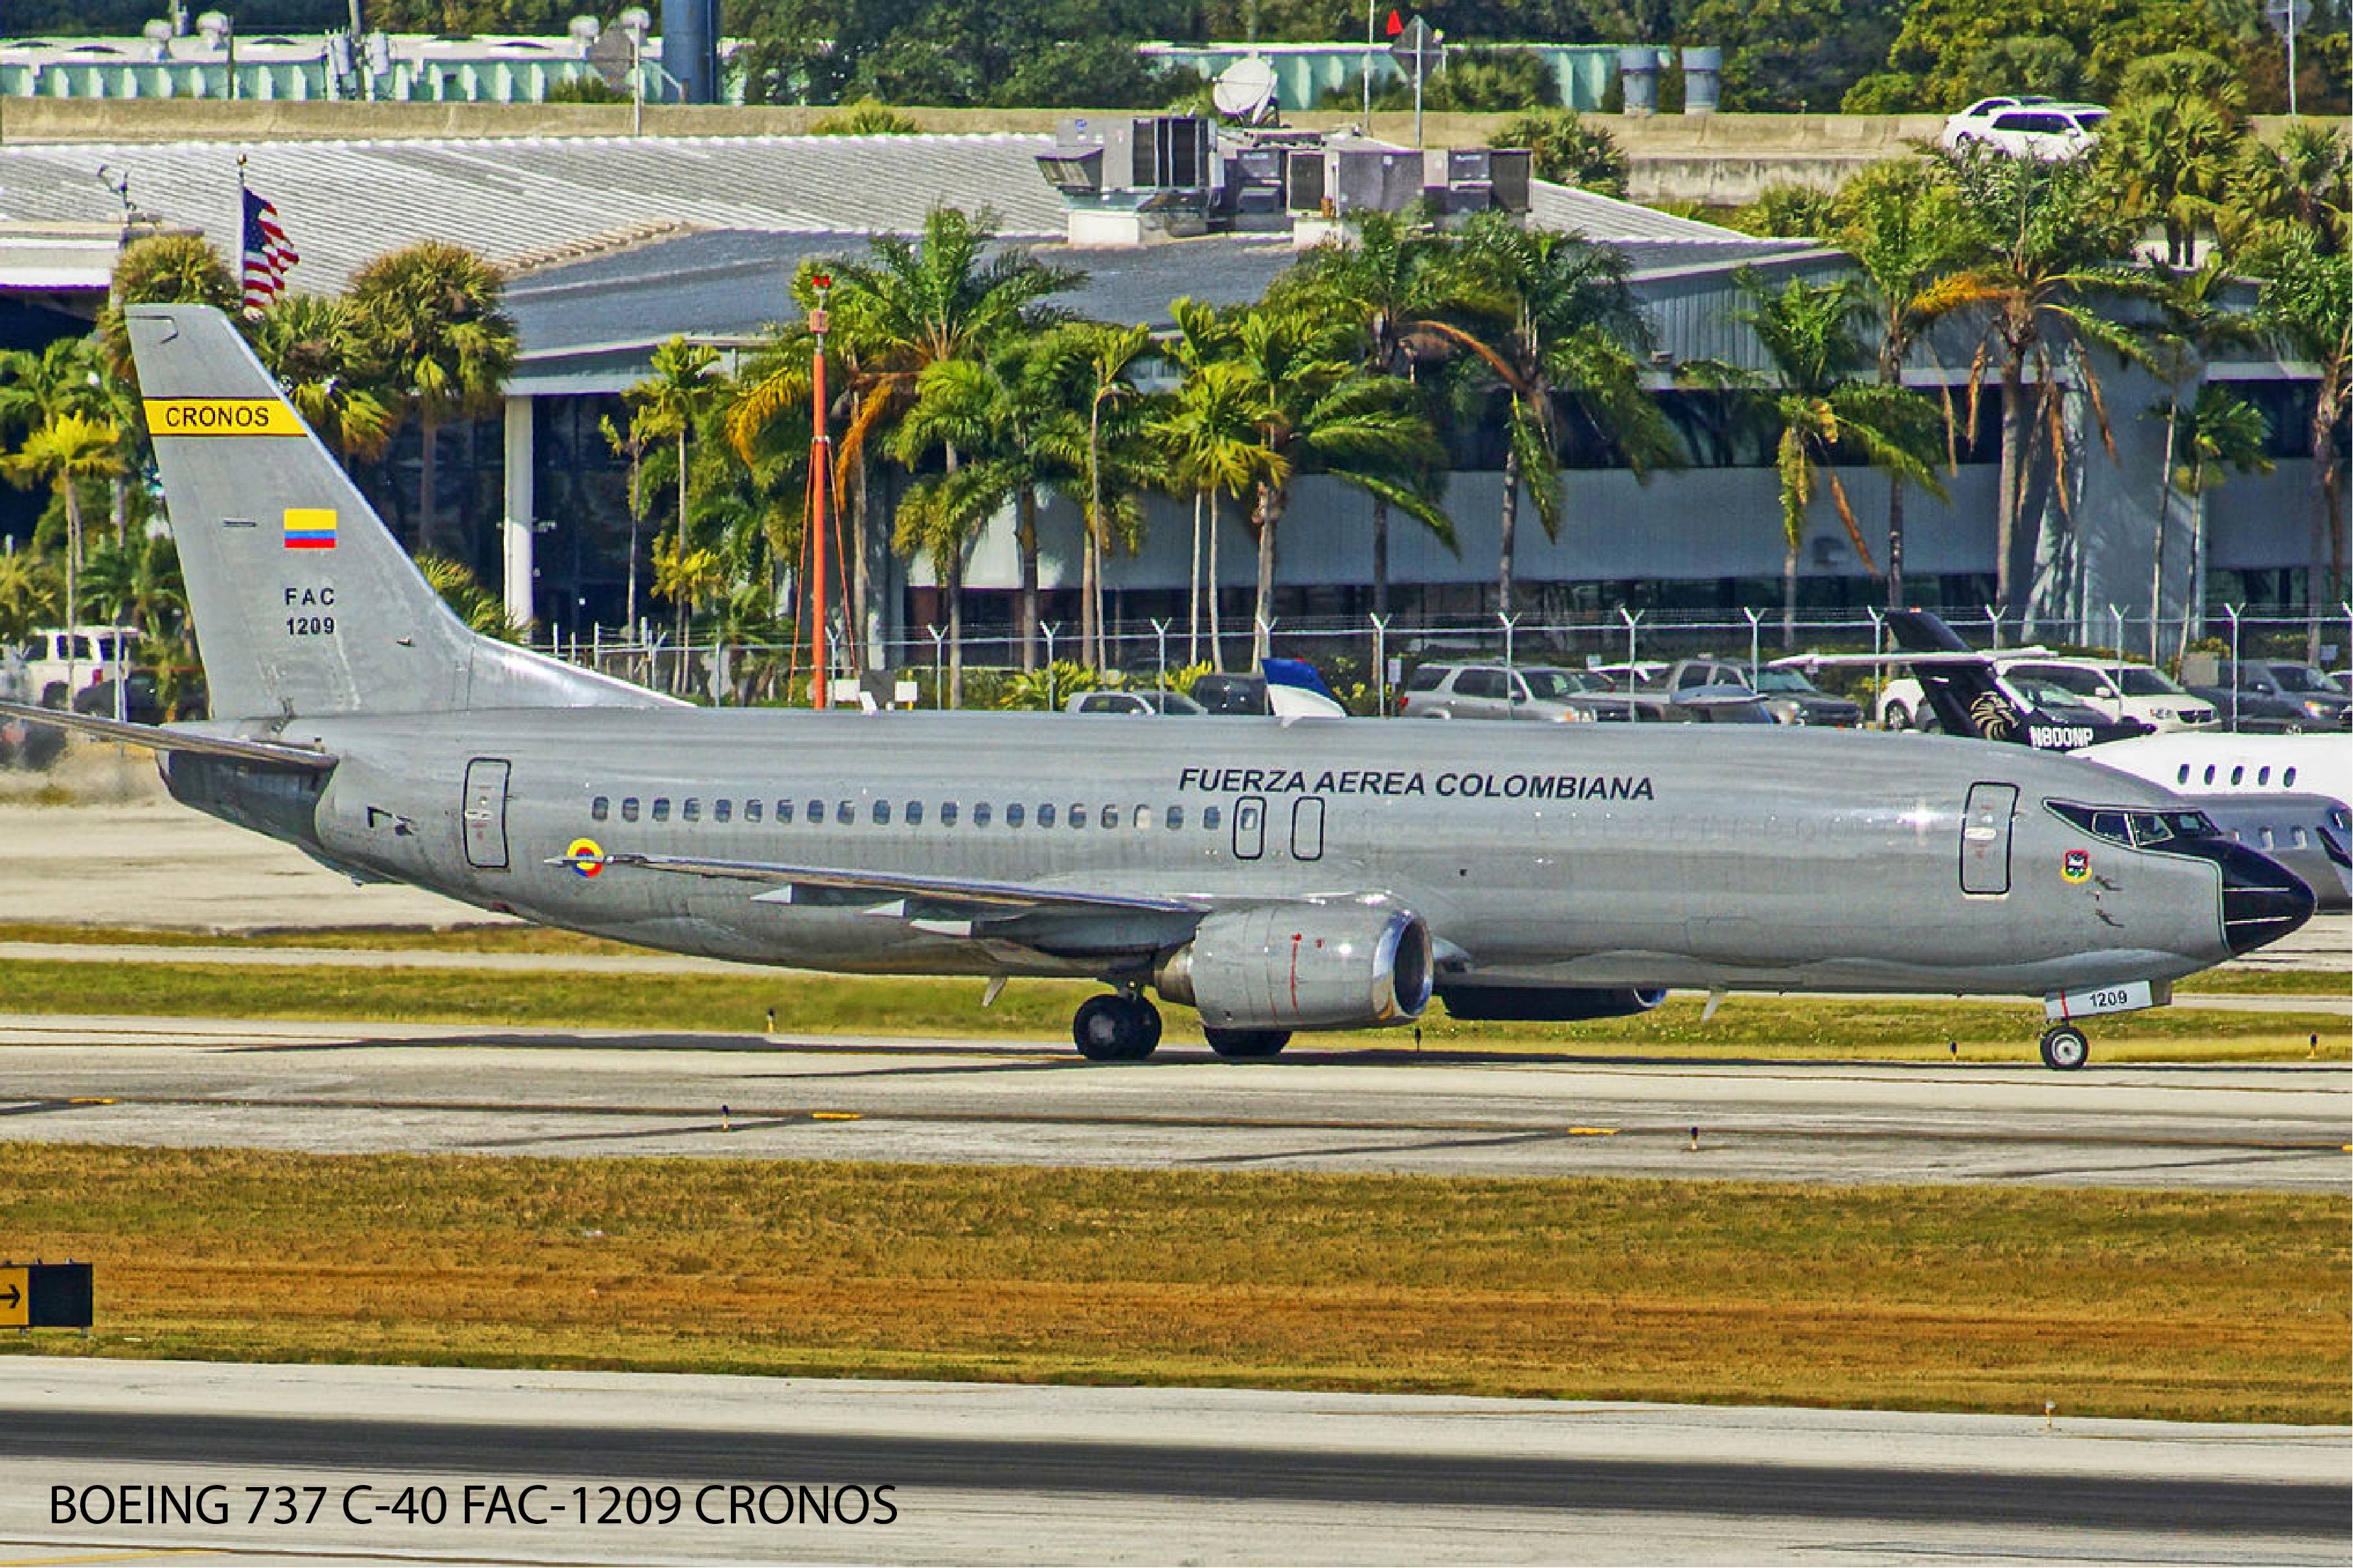 BOEING 737 C-40 FAC-1209 CRONOS